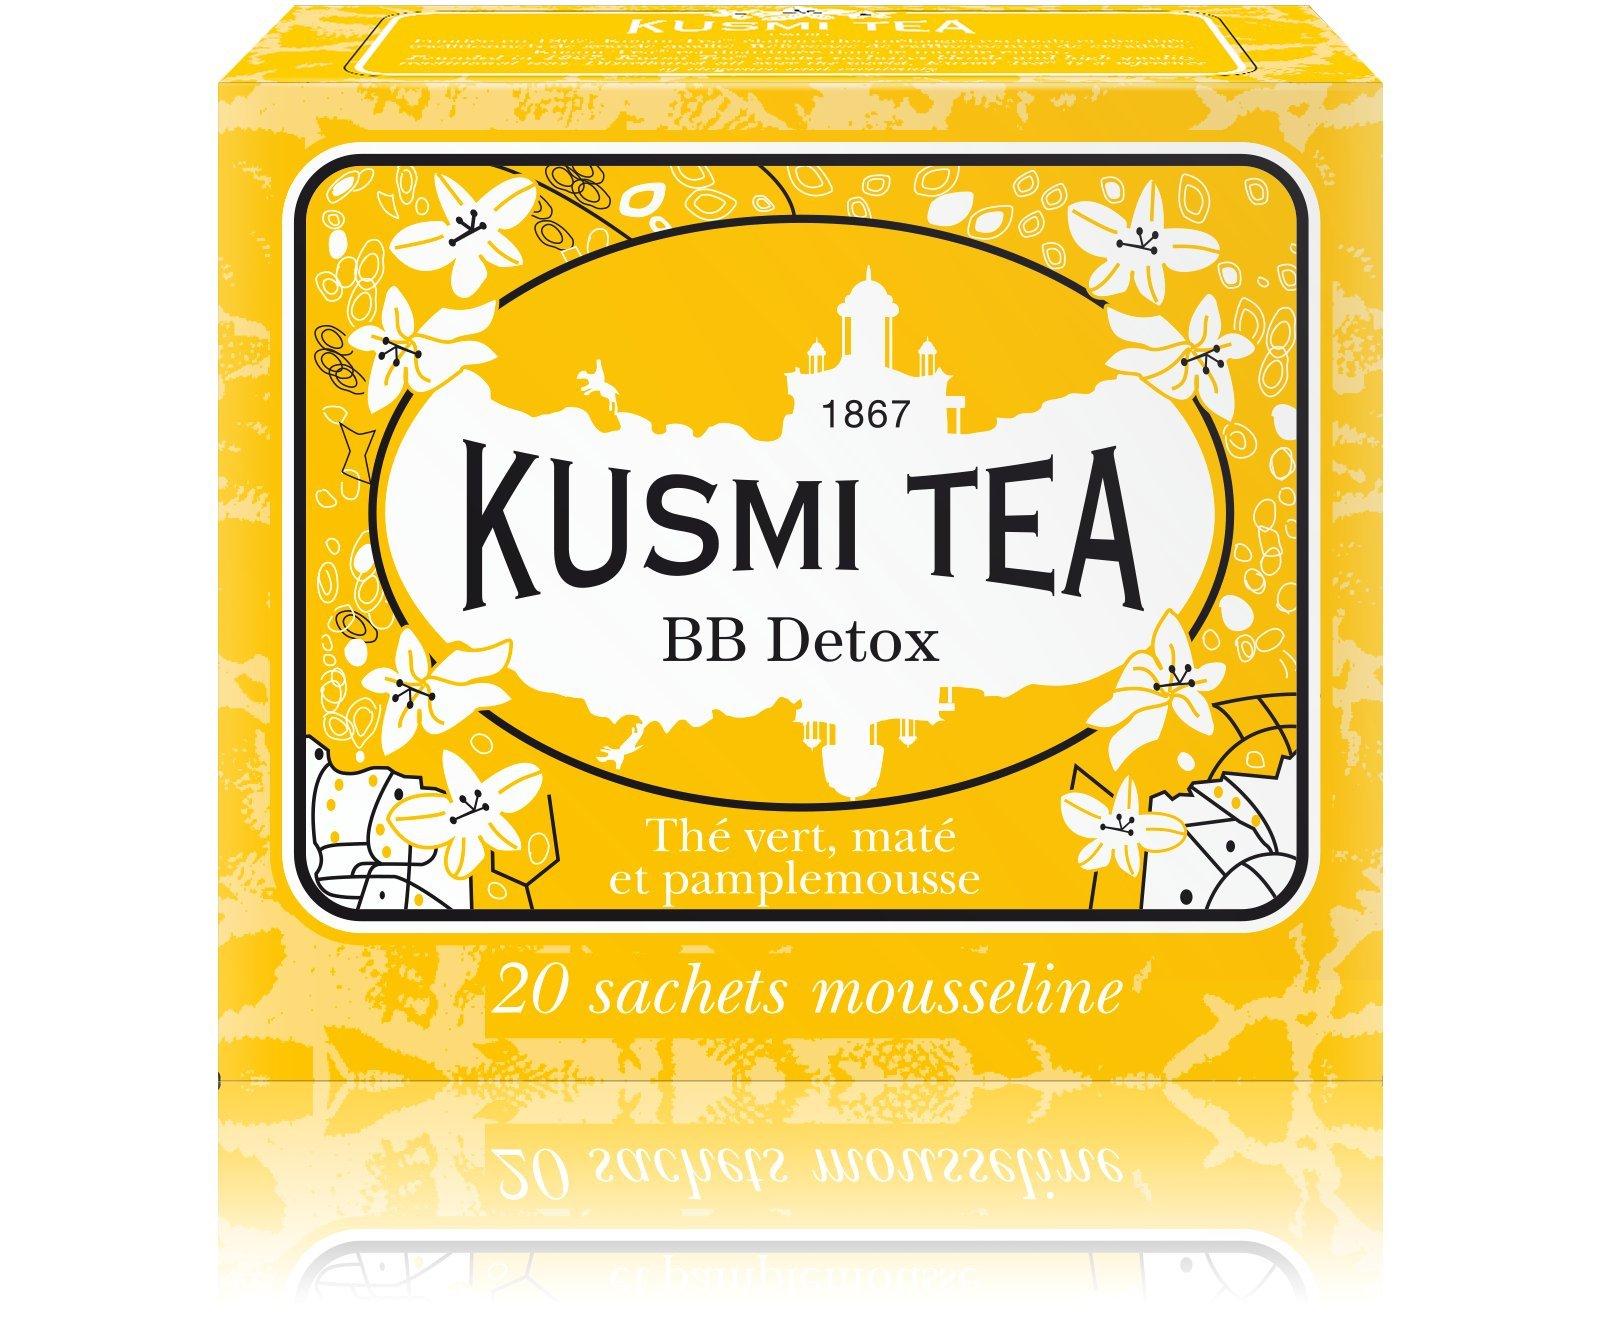 Kusmi Tea - BB Detox - Natural Green Tea with Yerba Mate, Rooibos, Guarana, Dandelion Infusion with a Hint of Grapefruit - All Natural Premium Loose Leaf Green Tea Enveloped in 20 Muslin Tea Bags